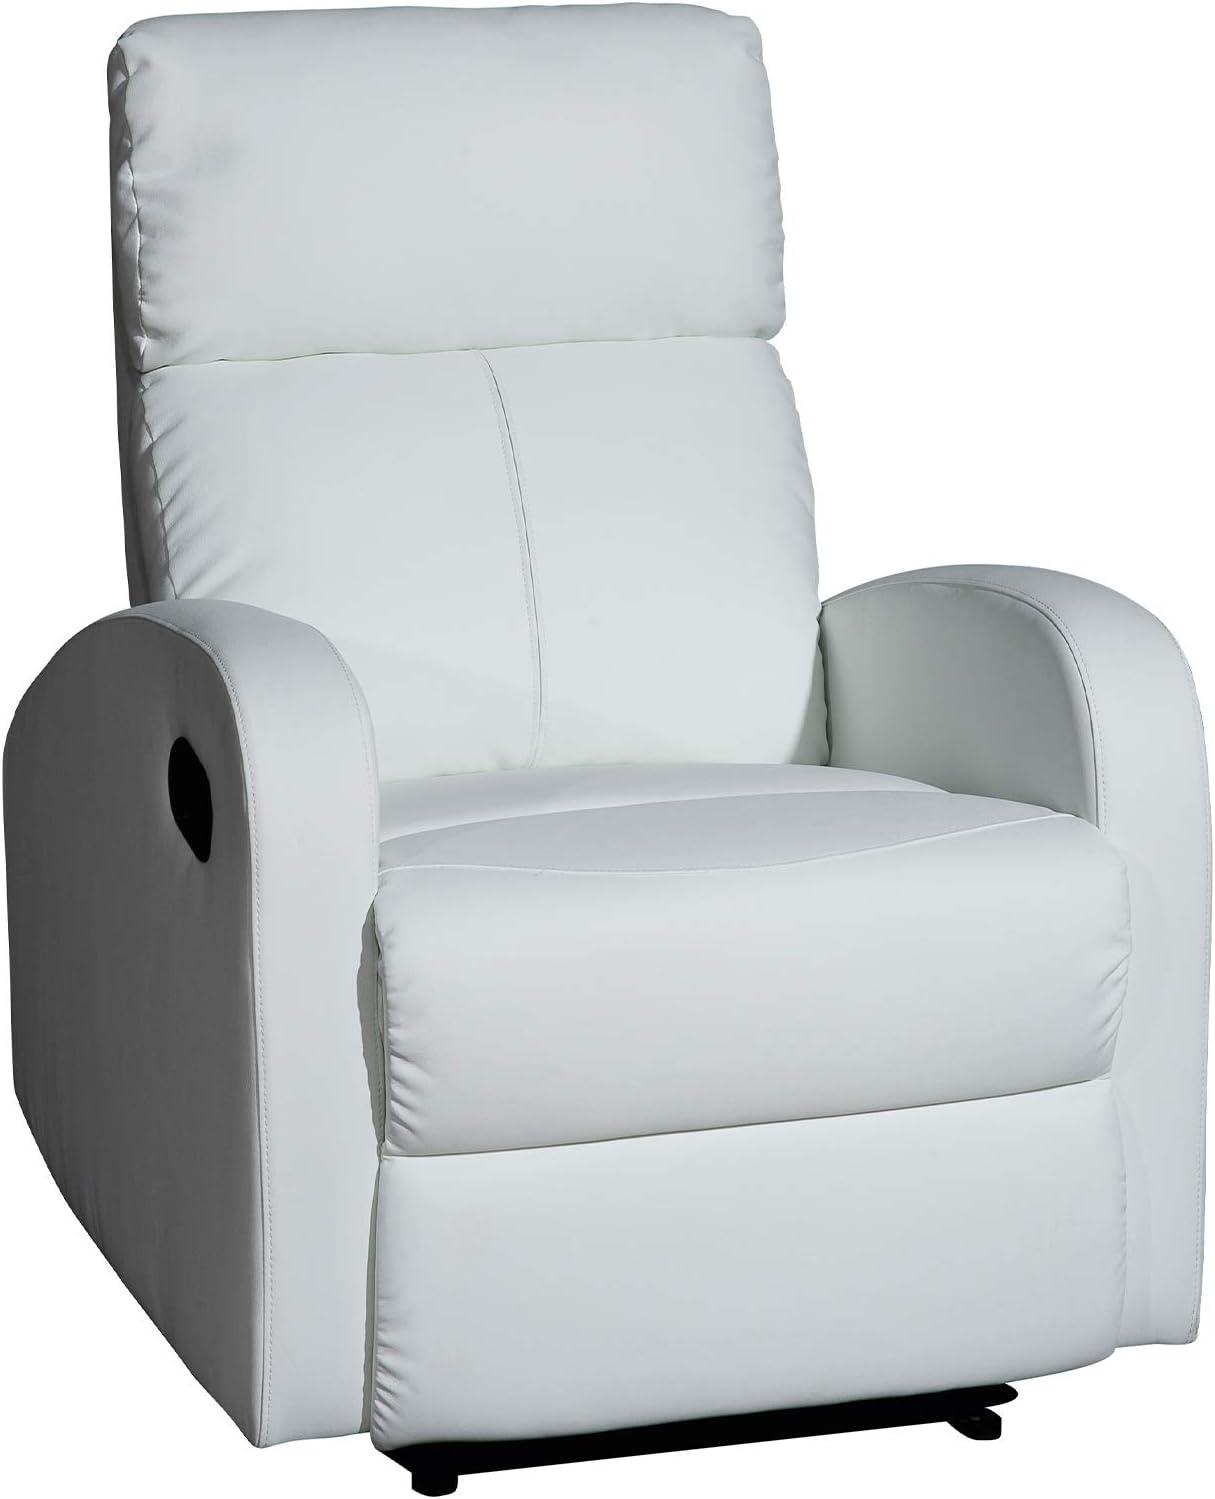 Sillón Relax reclinable Med - Modelo TAVIRA - Color Blanco - Material Ecopiel/Metal - Medidas 71 x 93 x 101 cm